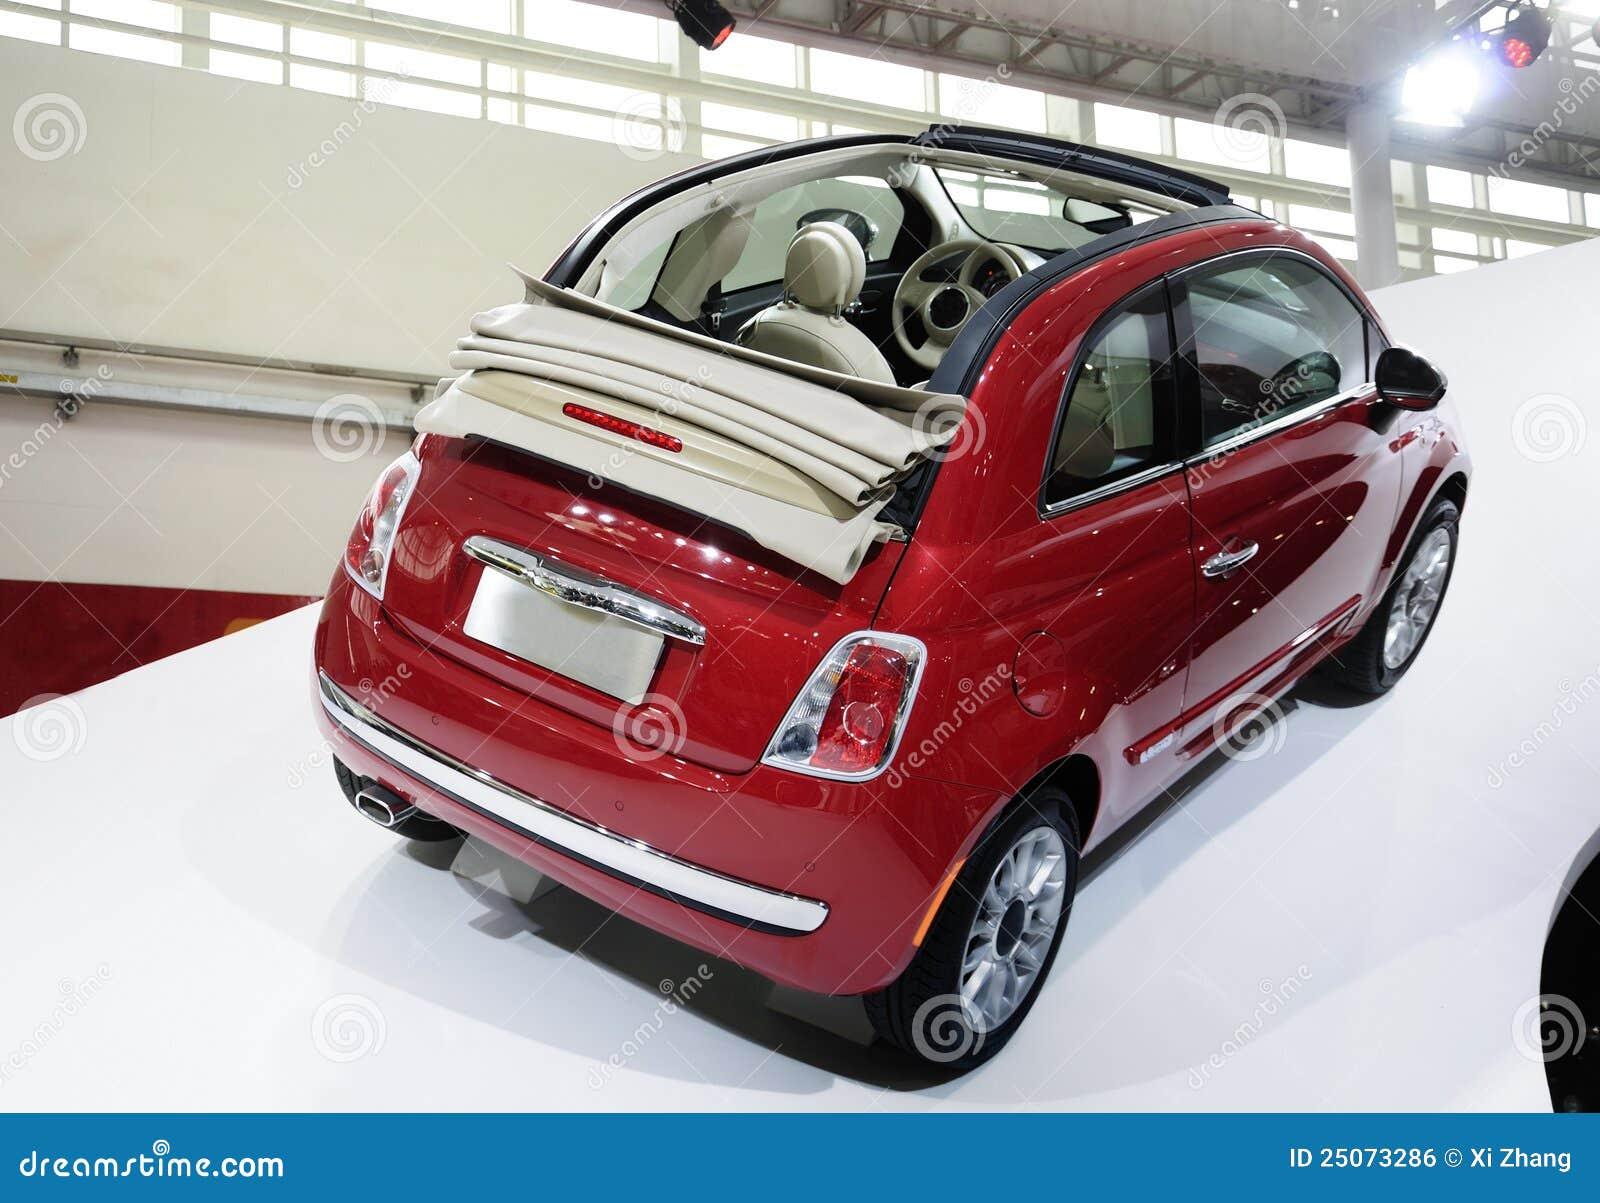 Red Fiat 500 car